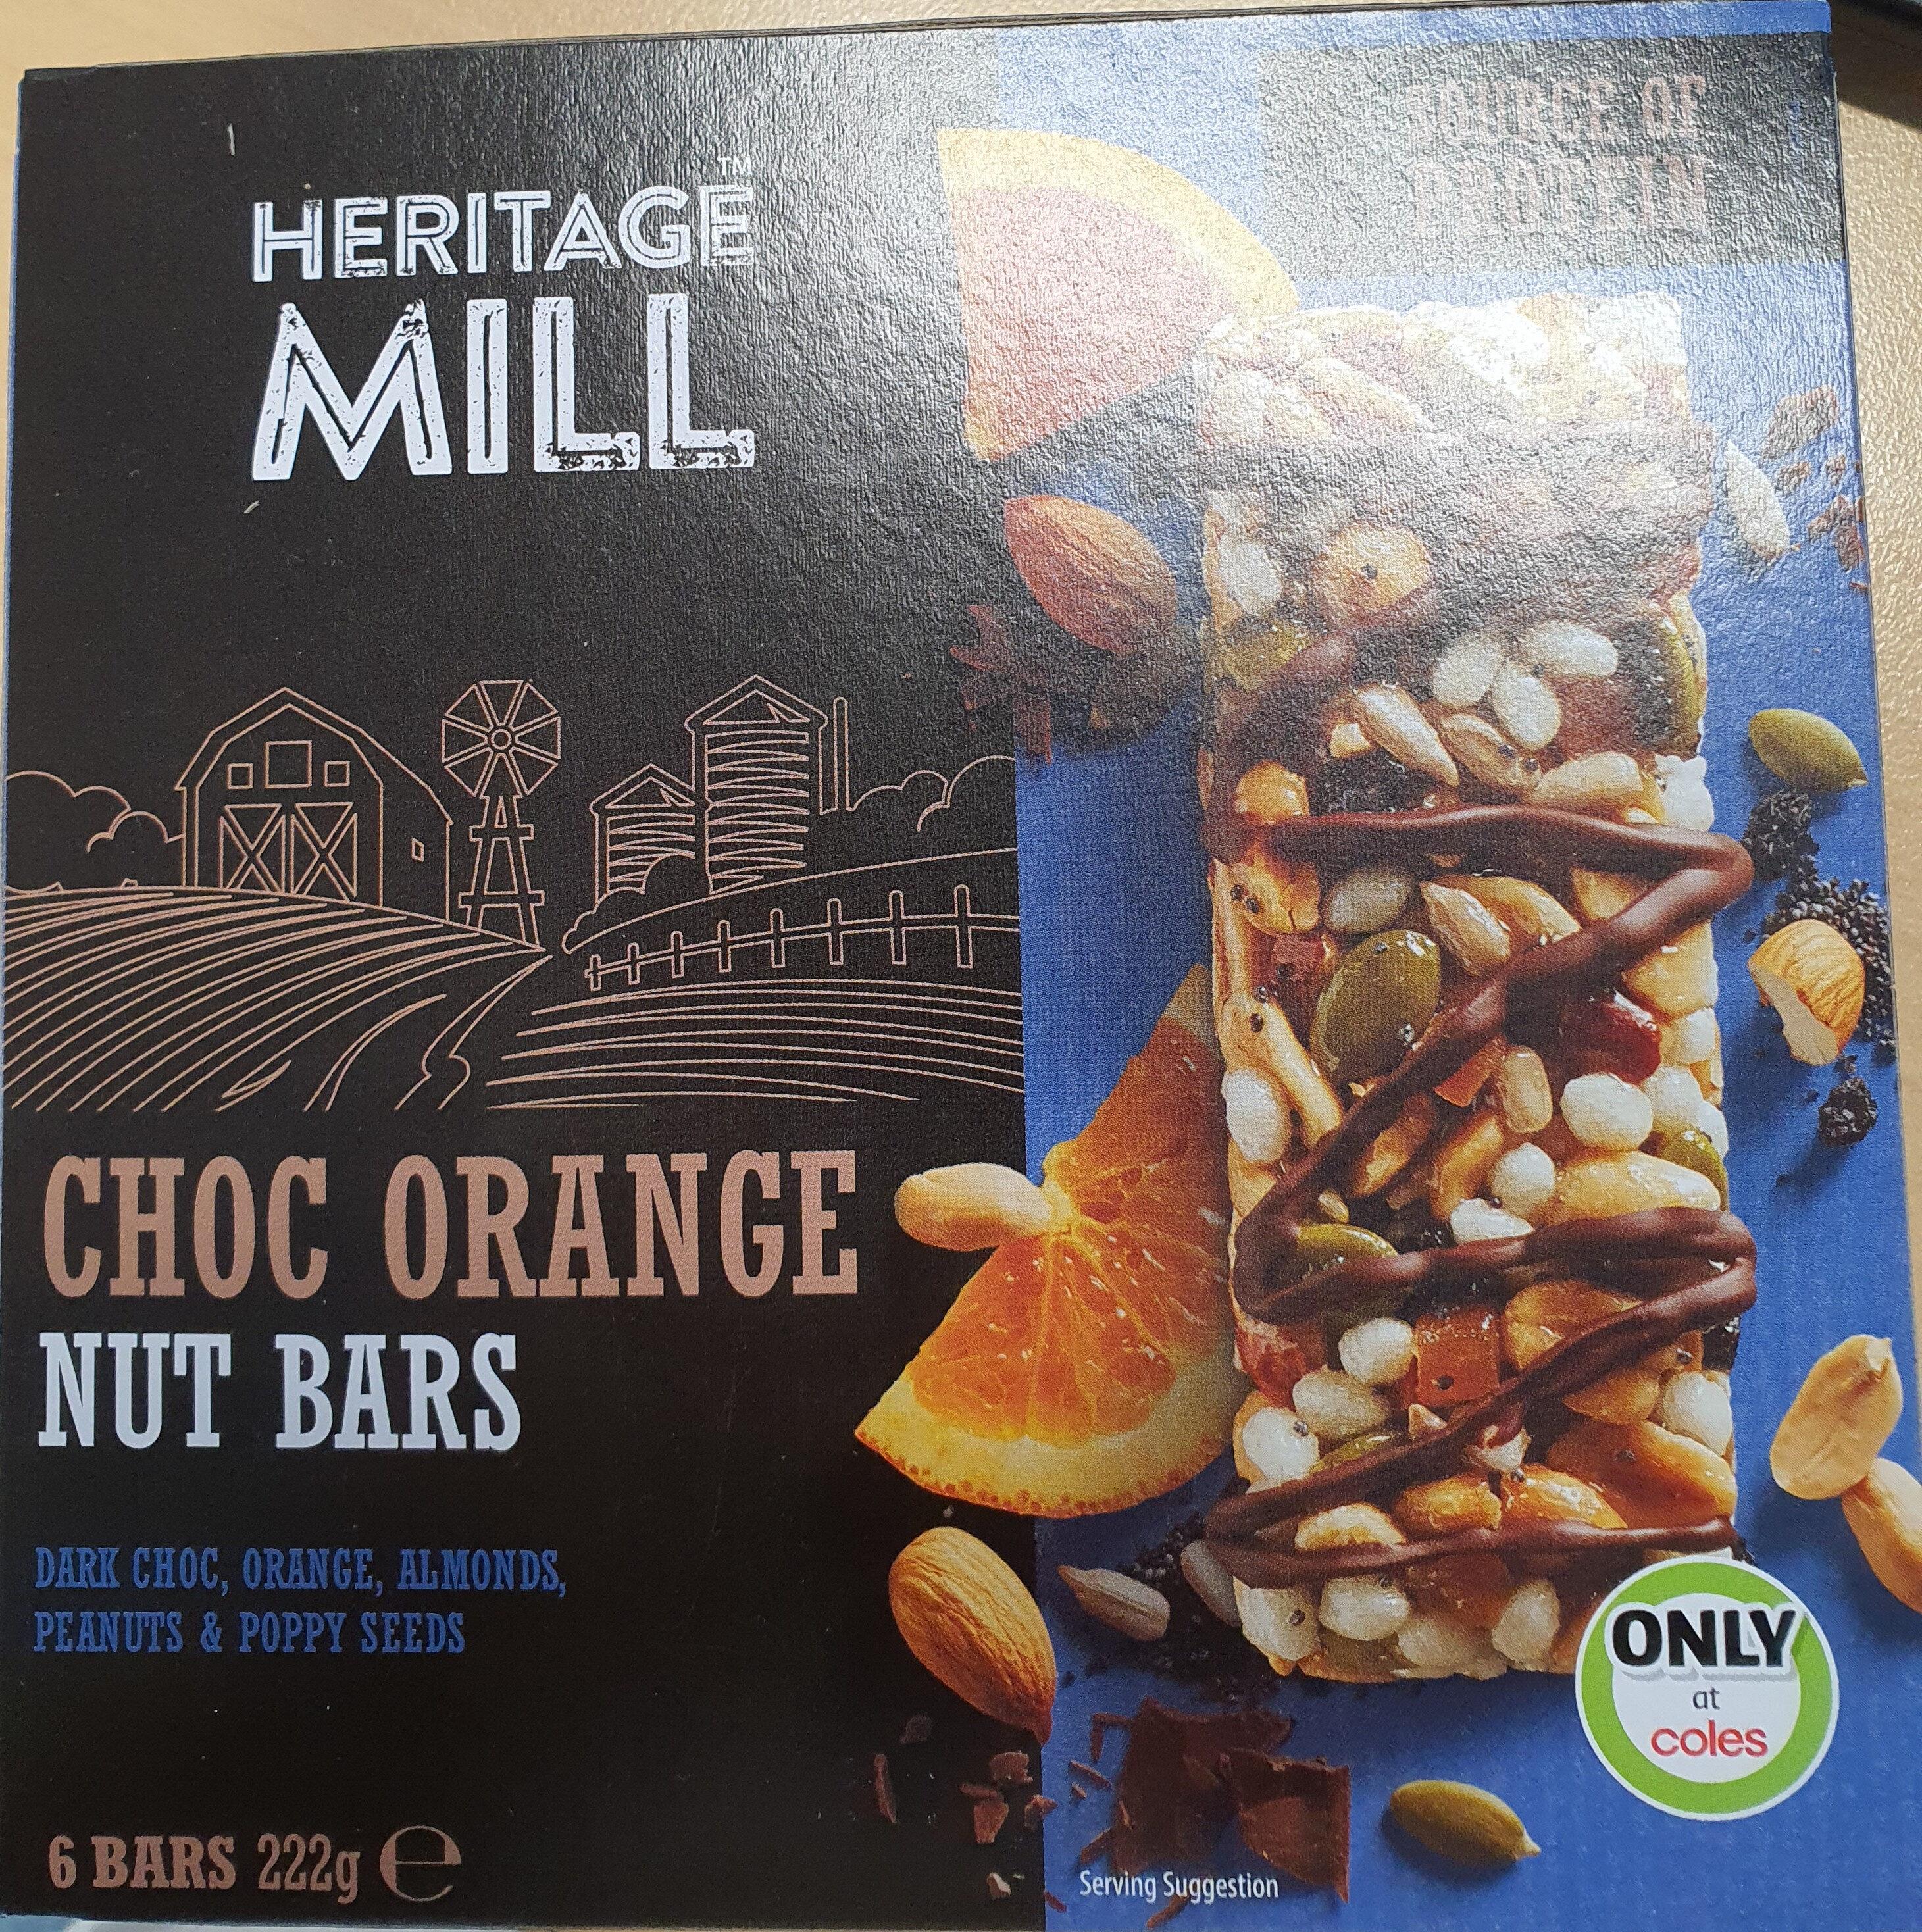 Choc Orange Nut Bars - Product - en